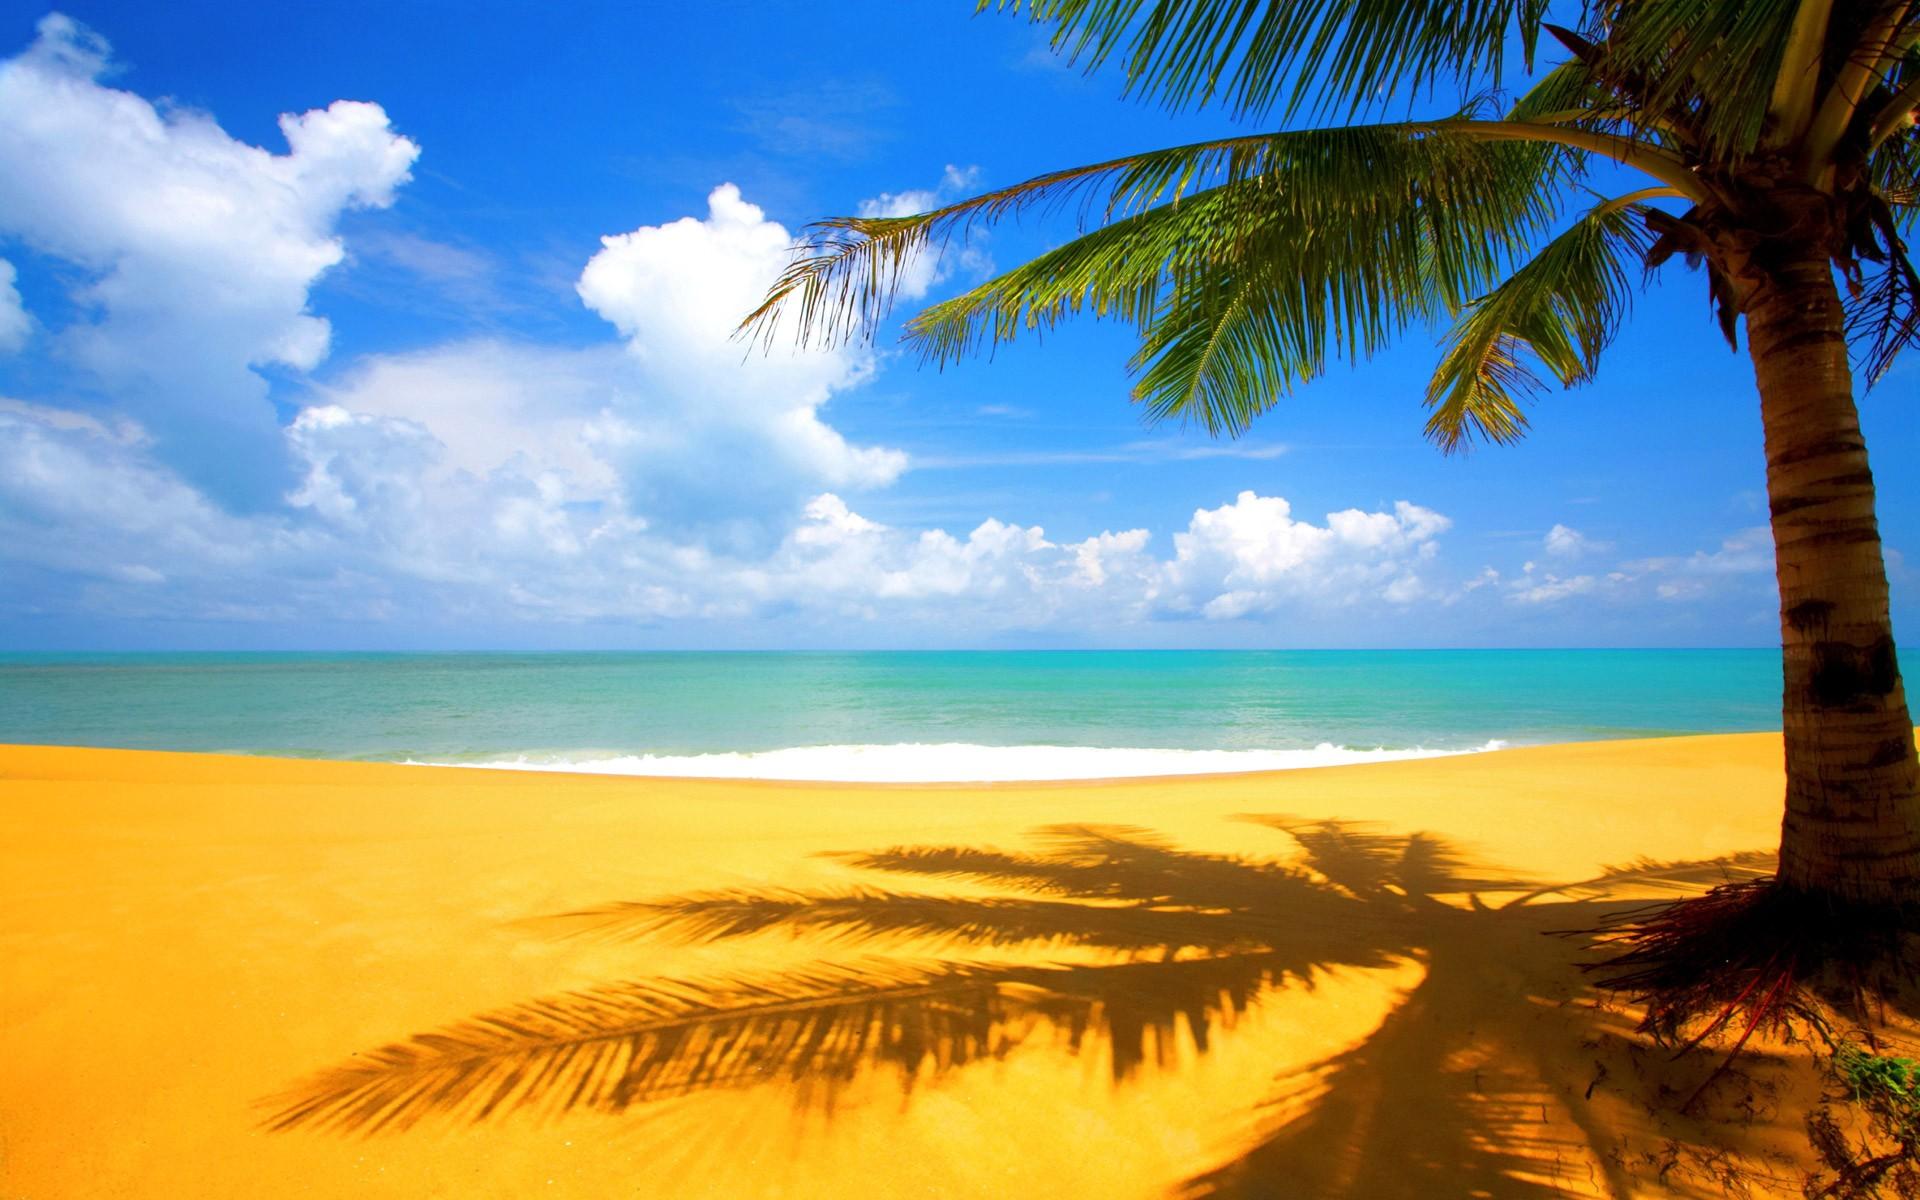 wallpapers beach photos beach pictures beach images beach images beach 1920x1200